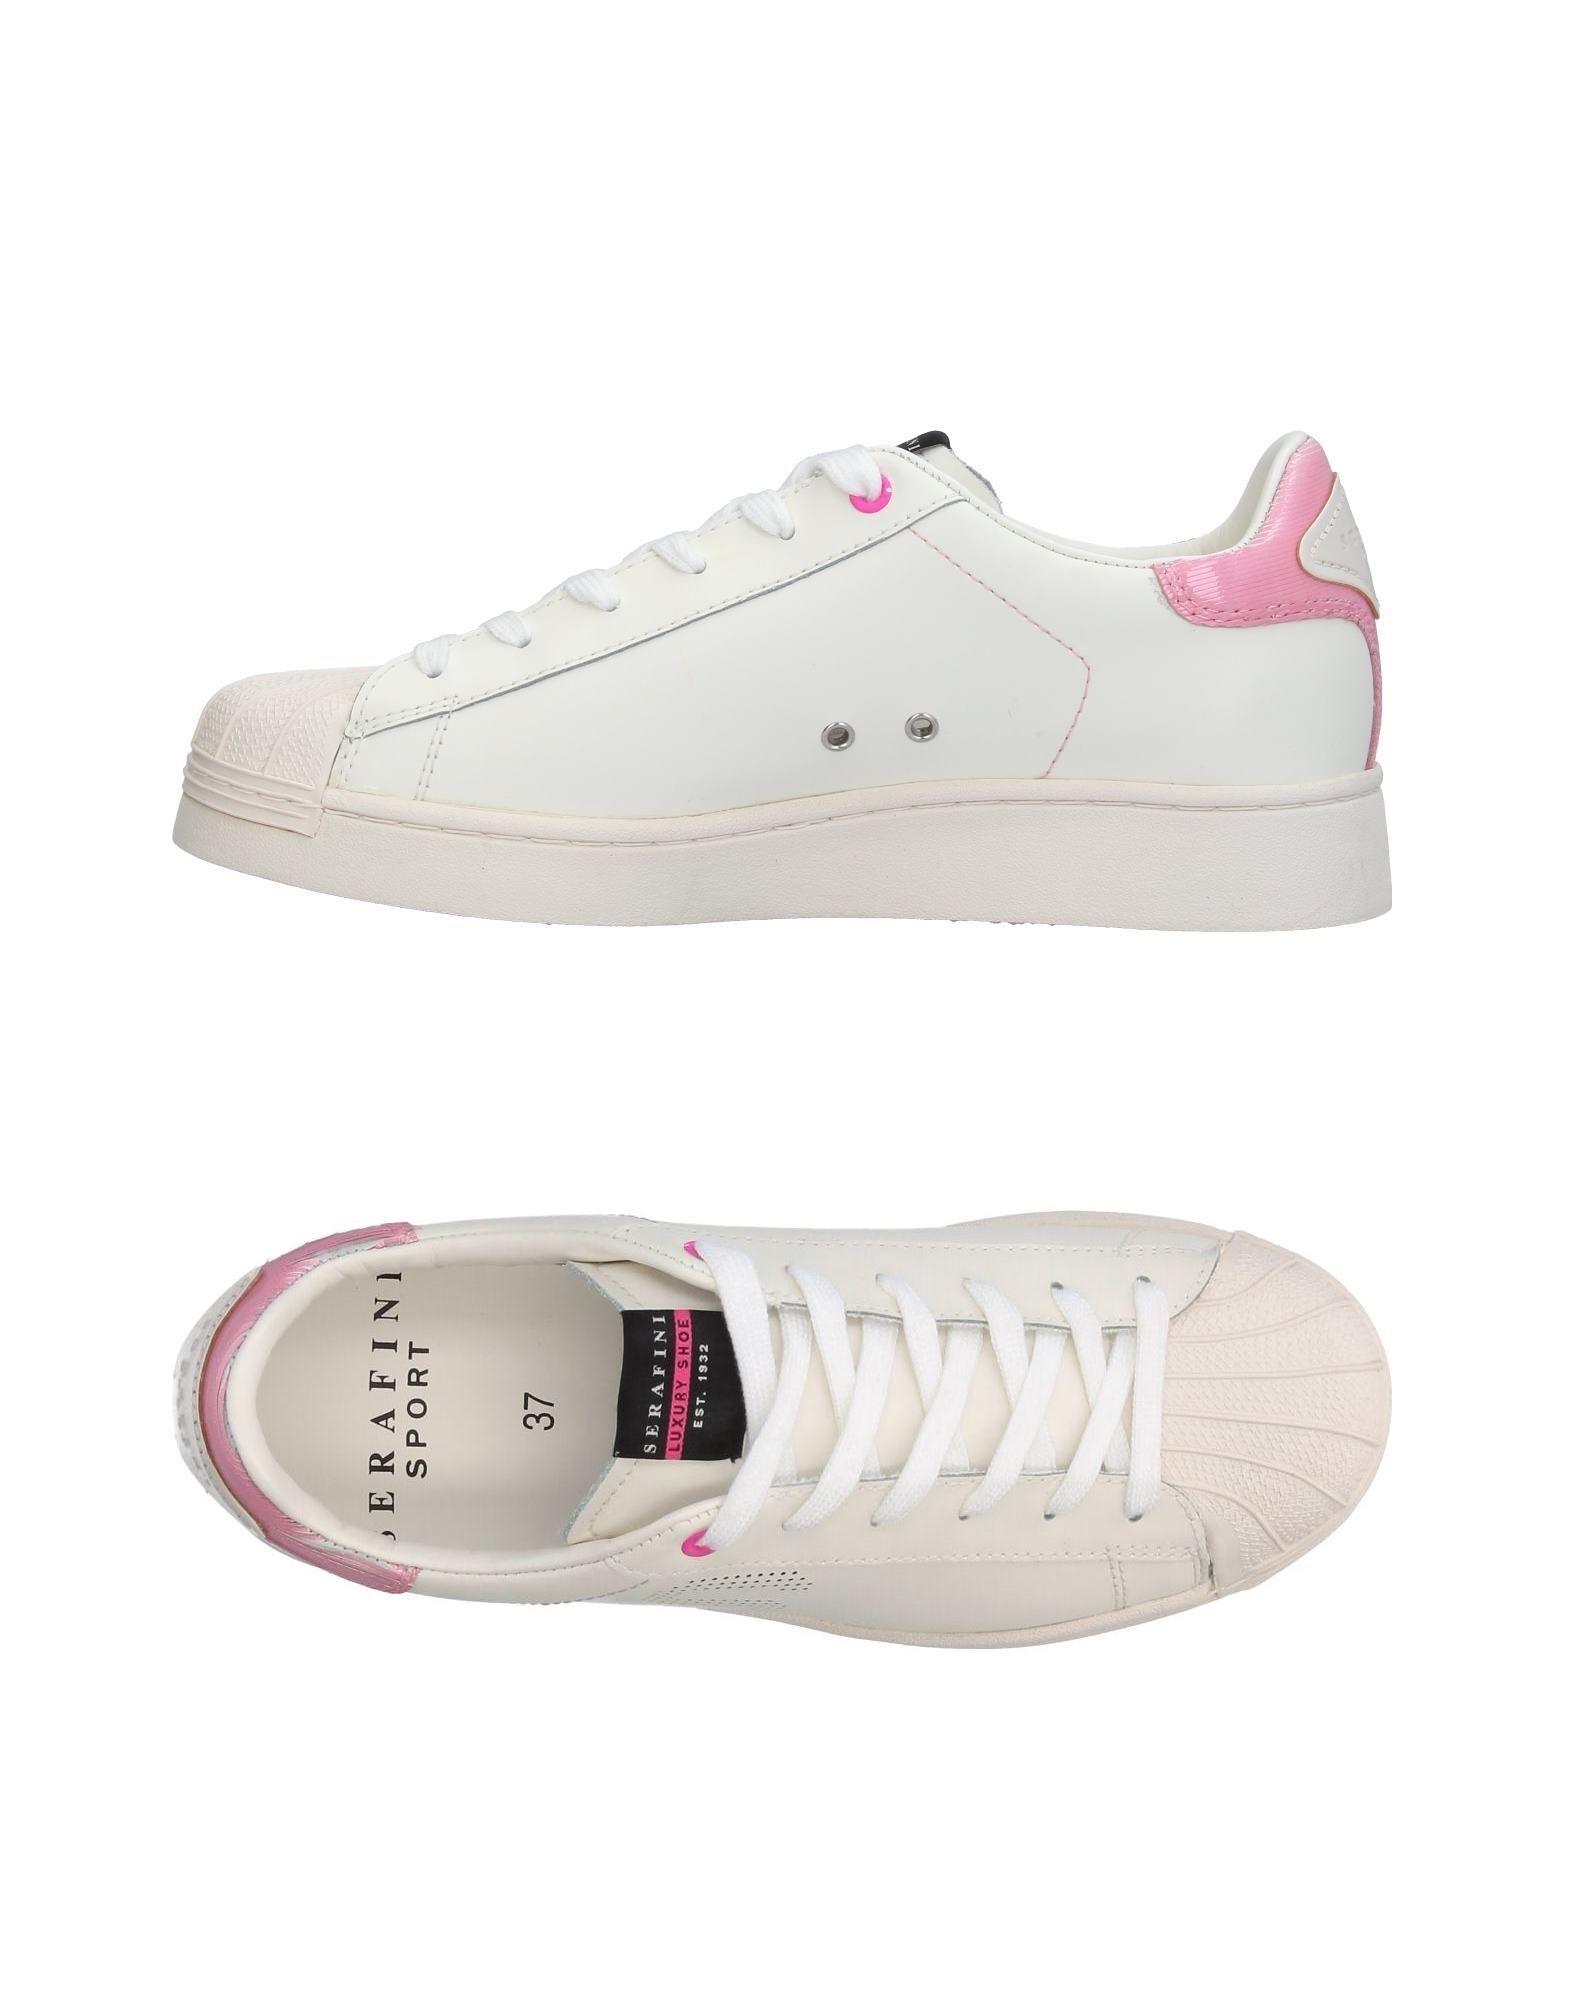 SERAFINI LUXURY Damen Low Sneakers & Tennisschuhe Farbe Elfenbein Größe 7 - broschei